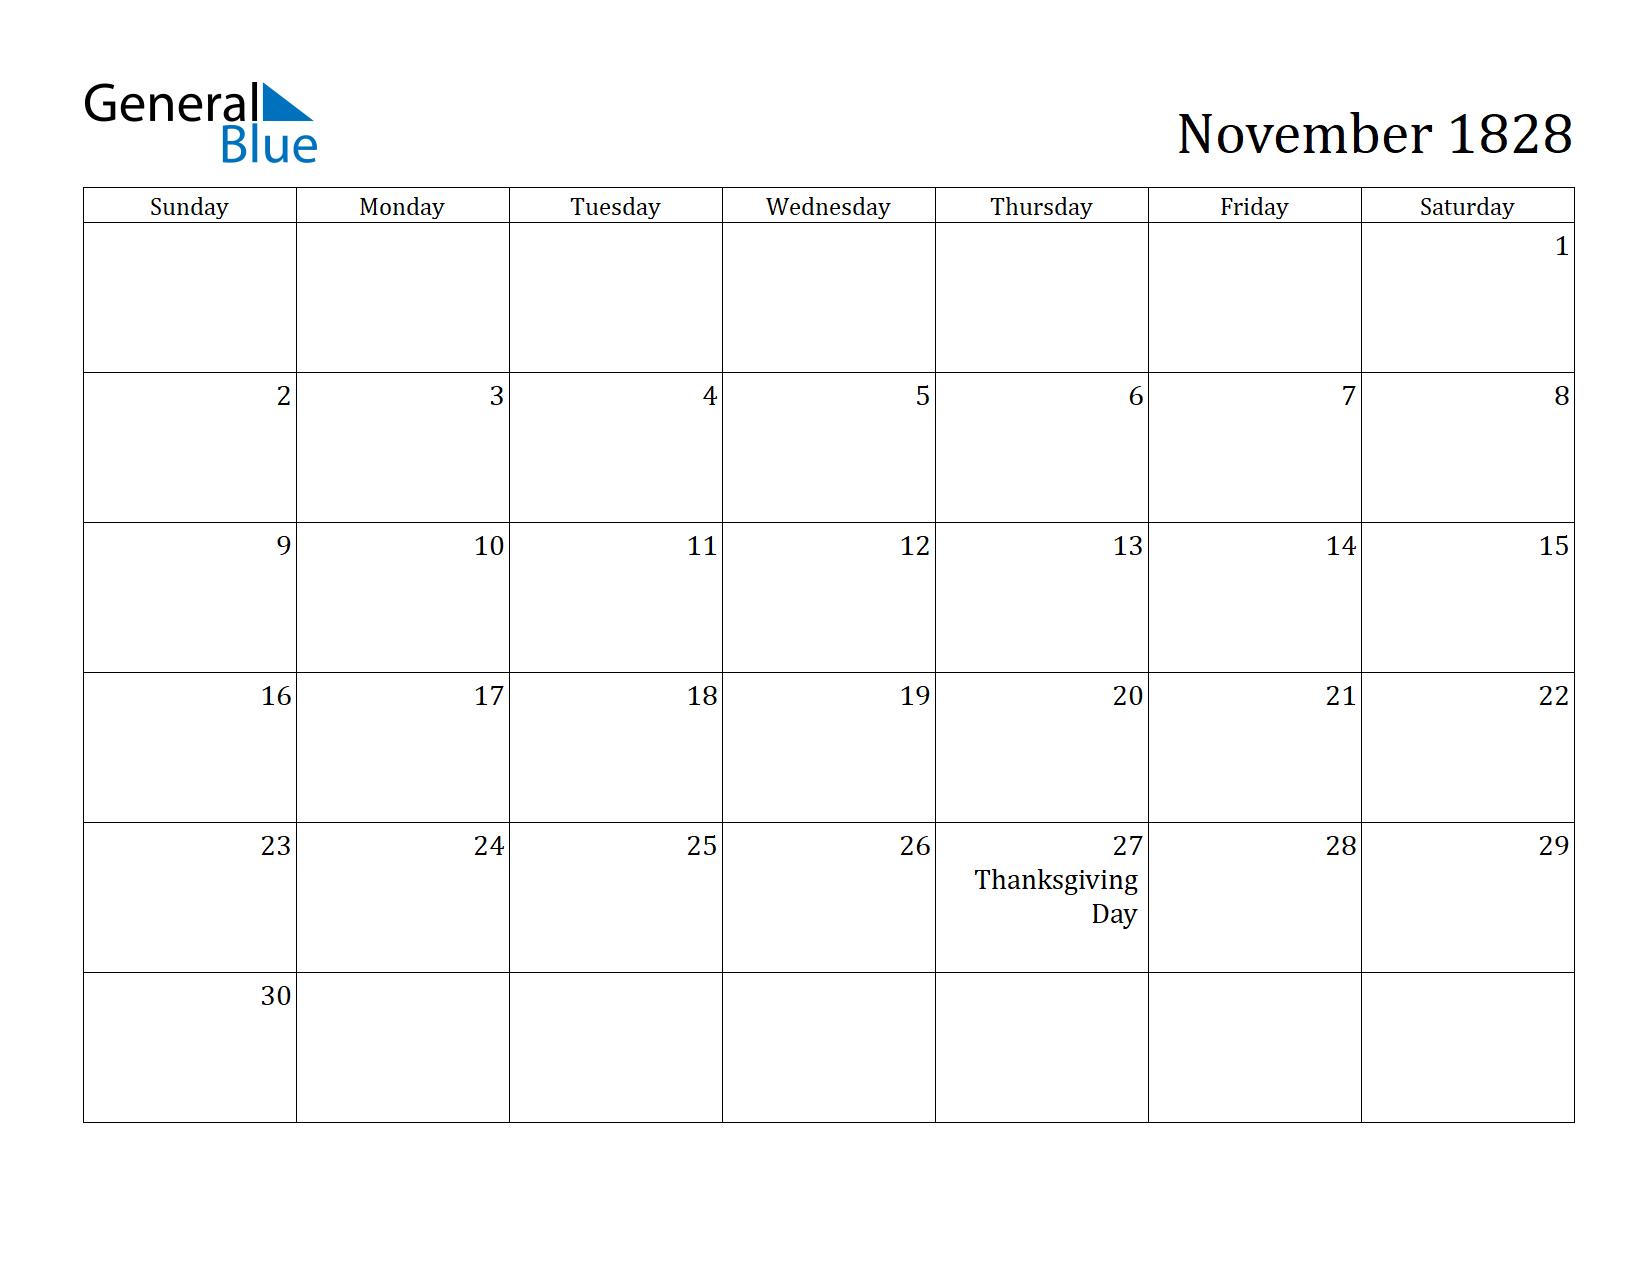 Image of November 1828 Calendar